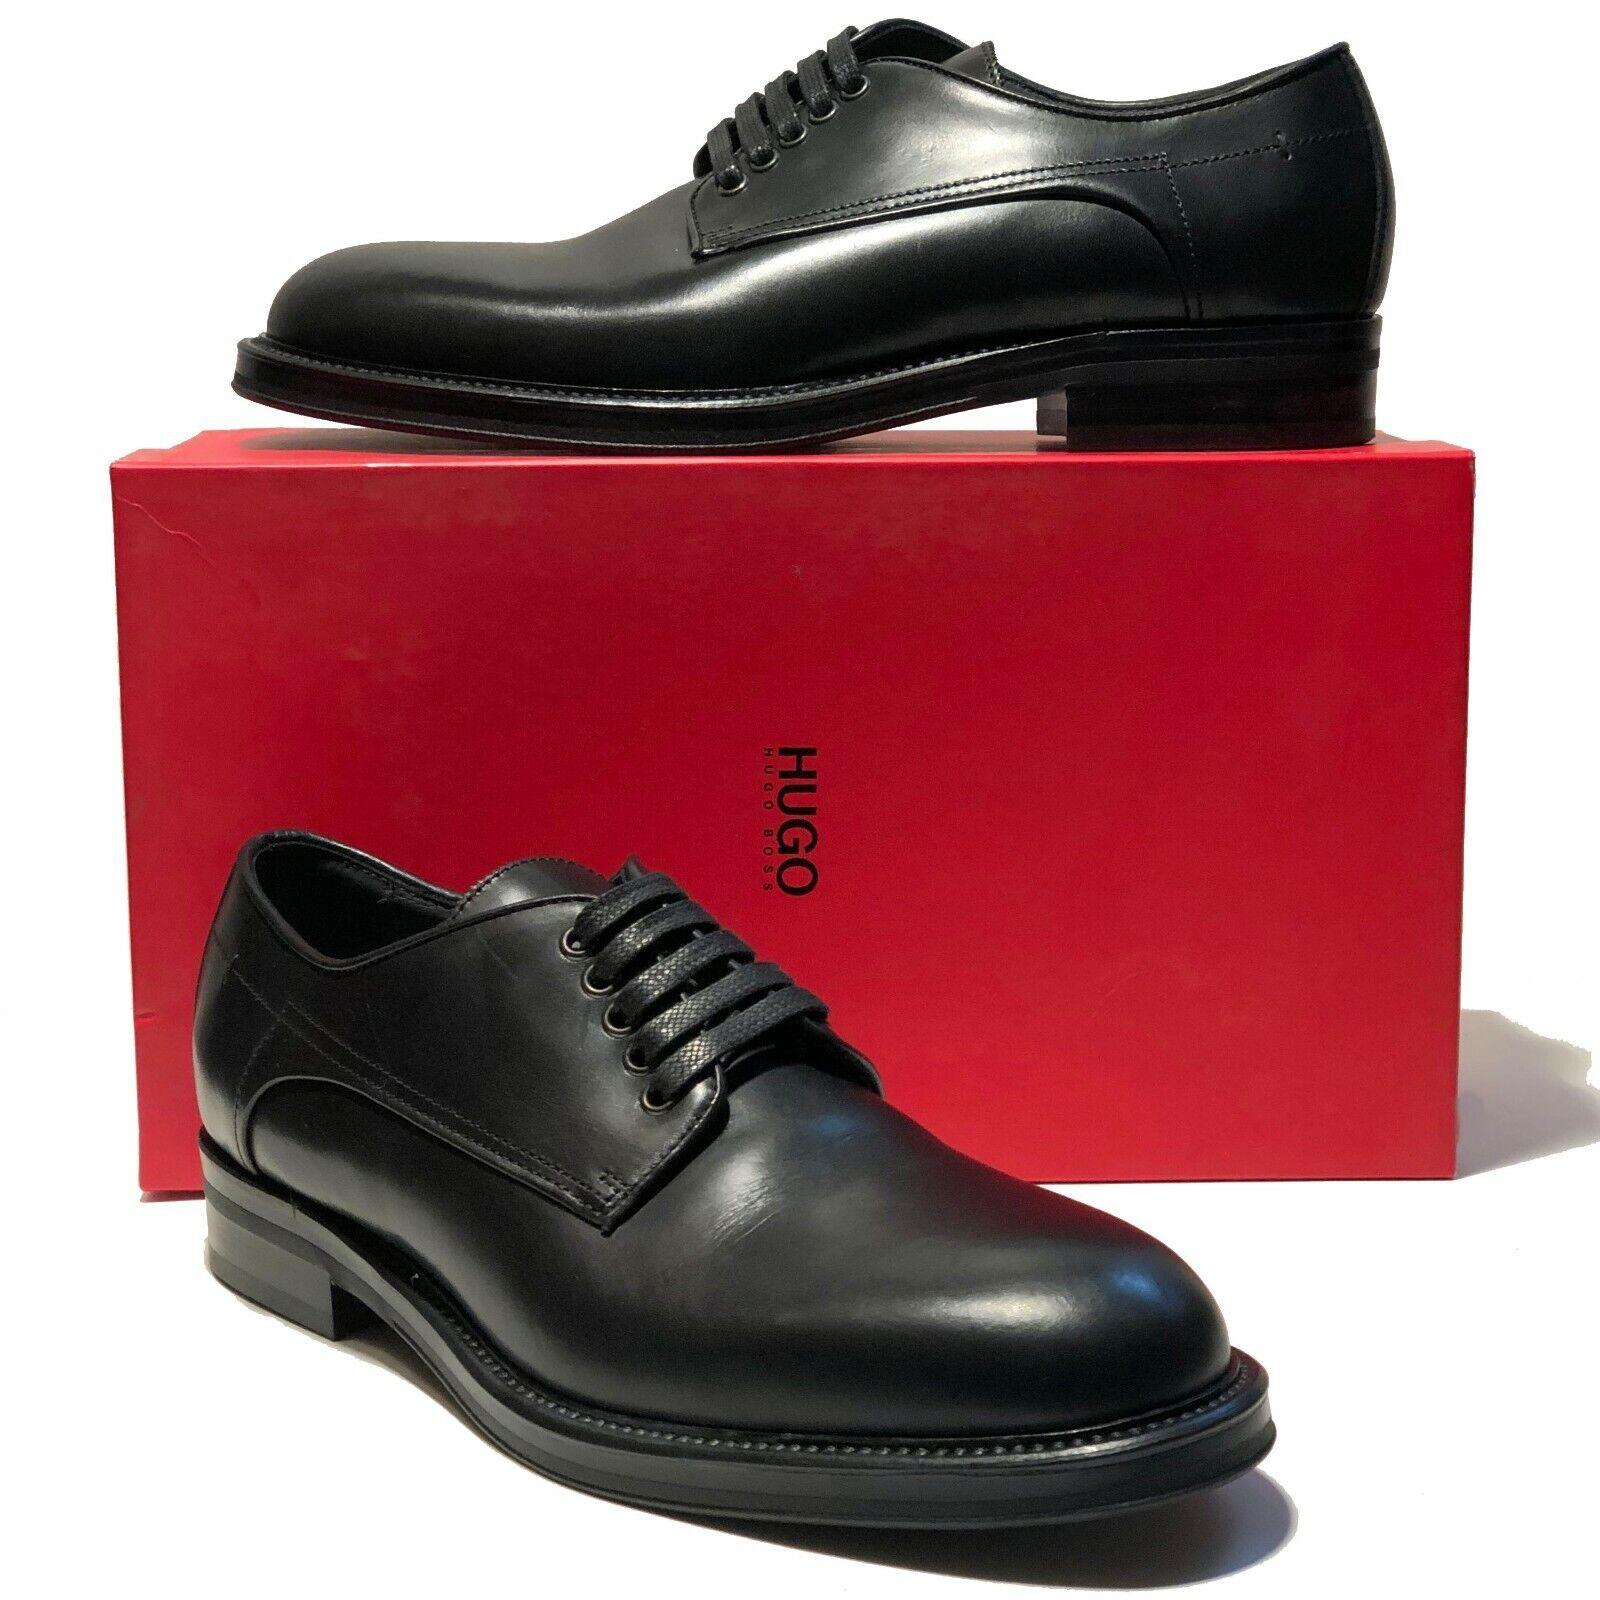 Hugo Boss  MELIO Leather Mens Dress Oxford 10.5 43.5 scarpe Formal Casual